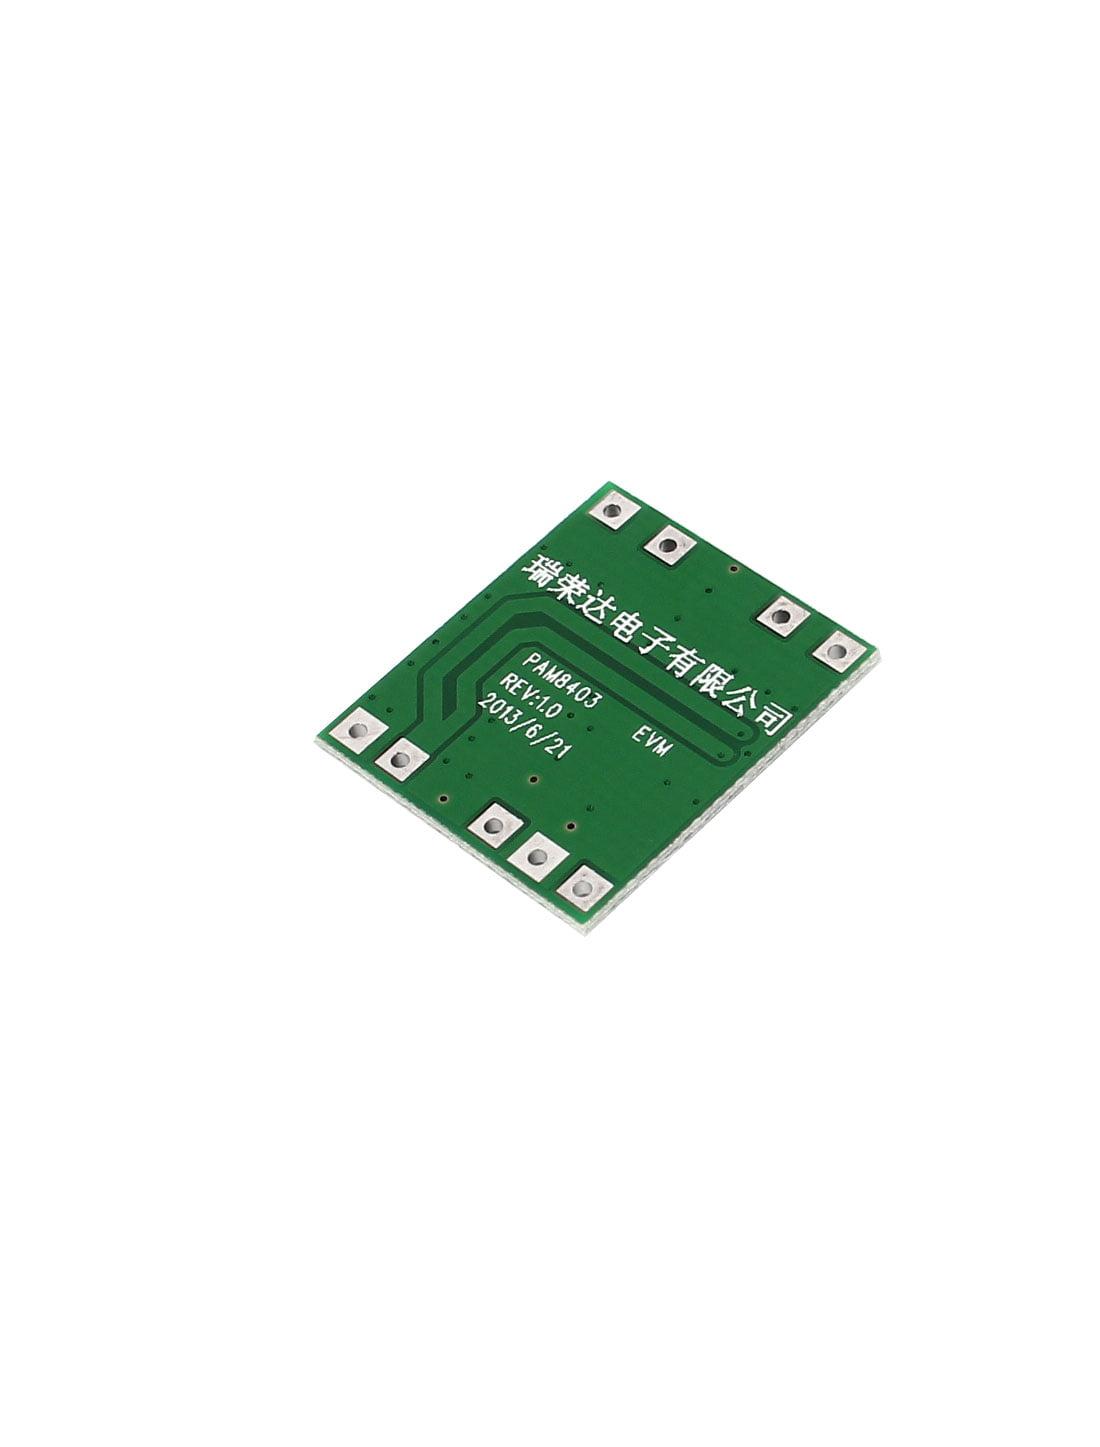 2 Pcs 5v Super Mini Pam8403 Class Digital Usb Power Amplifier Miniature Electronic Printed Circuit Card Control Pcb Board